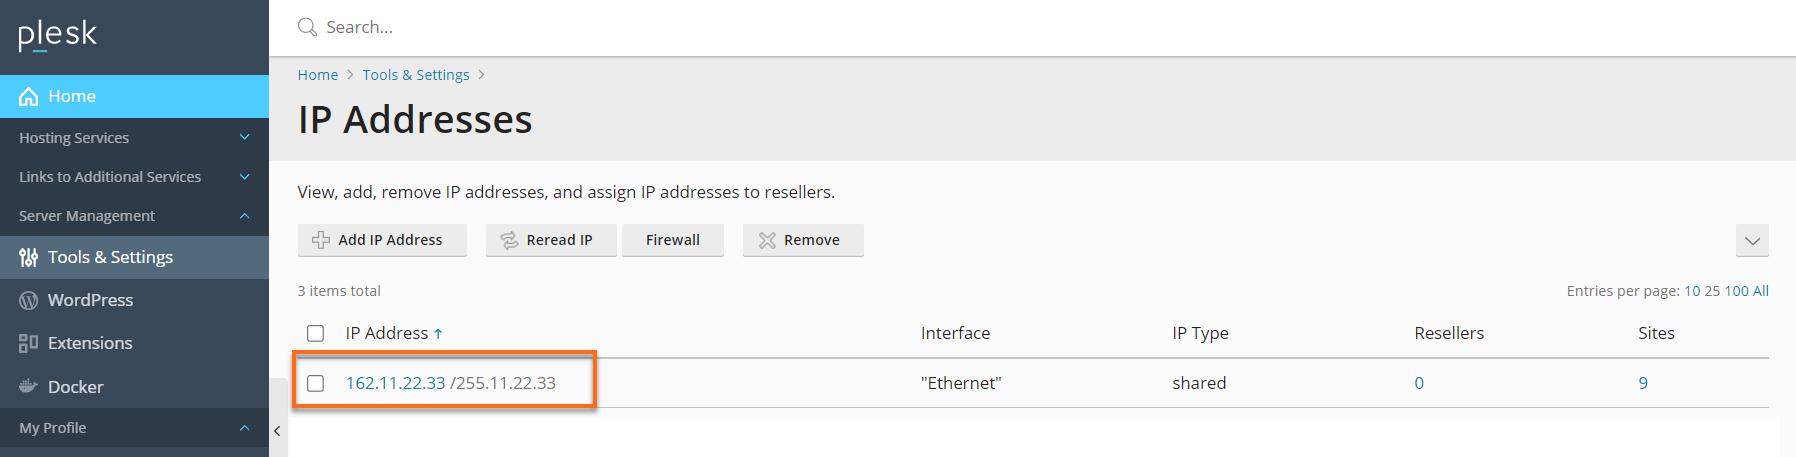 Modify an IP address